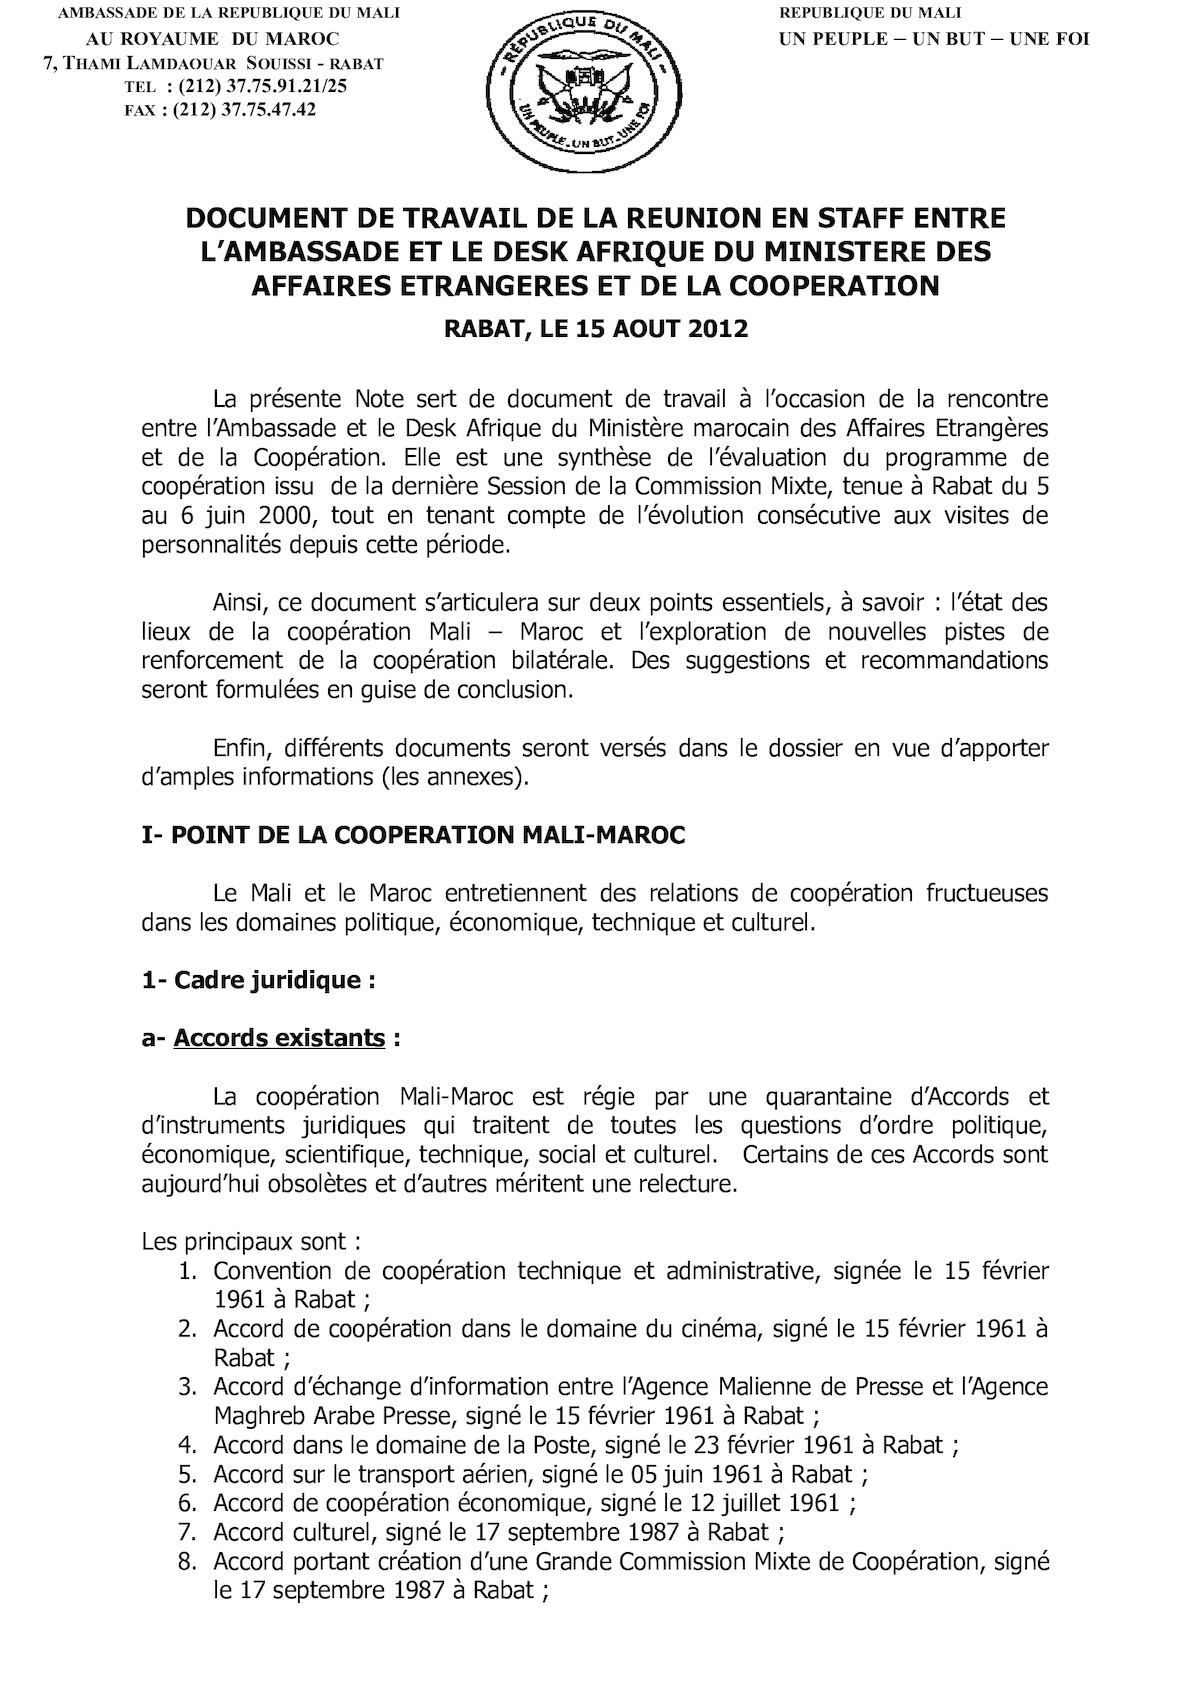 Document De Travail Amba MAEC Version 2